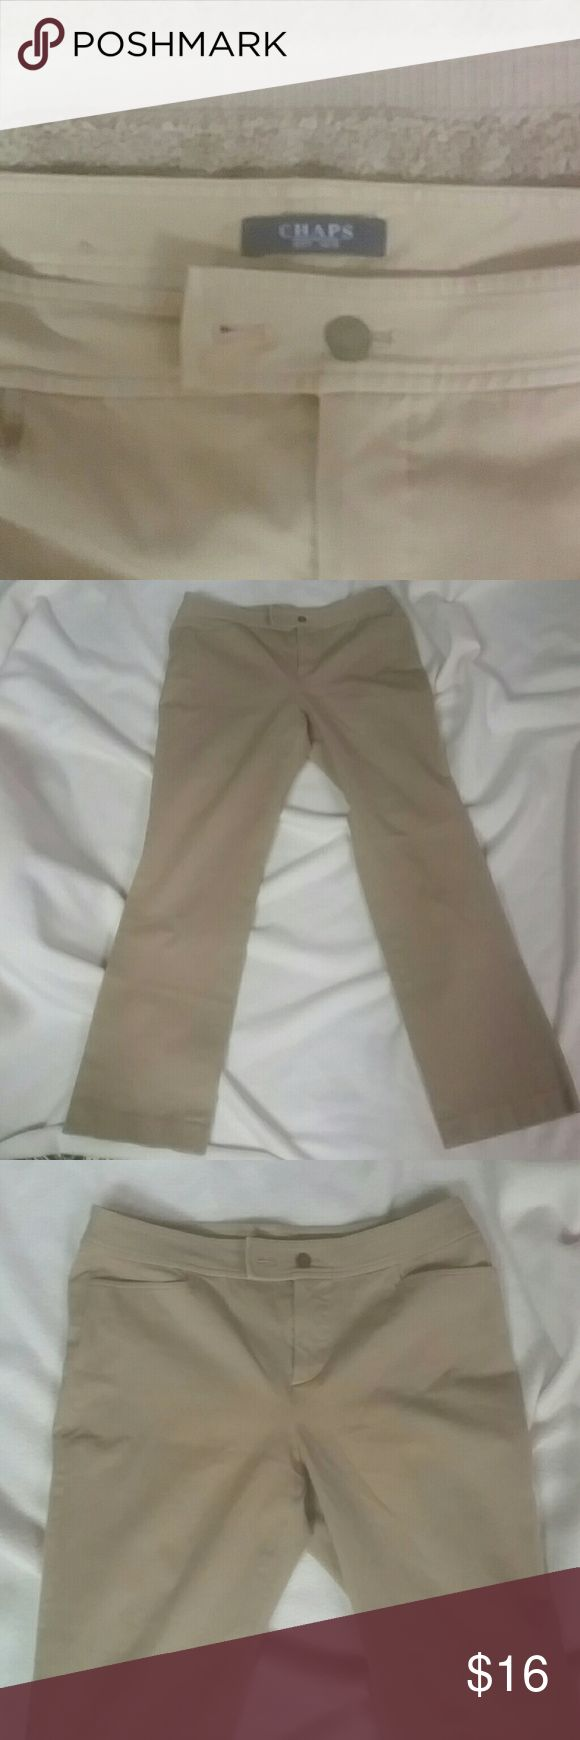 Camps kaki pants elastic and cotton kaki pants very good conditon Chaps Pants Boot Cut & Flare